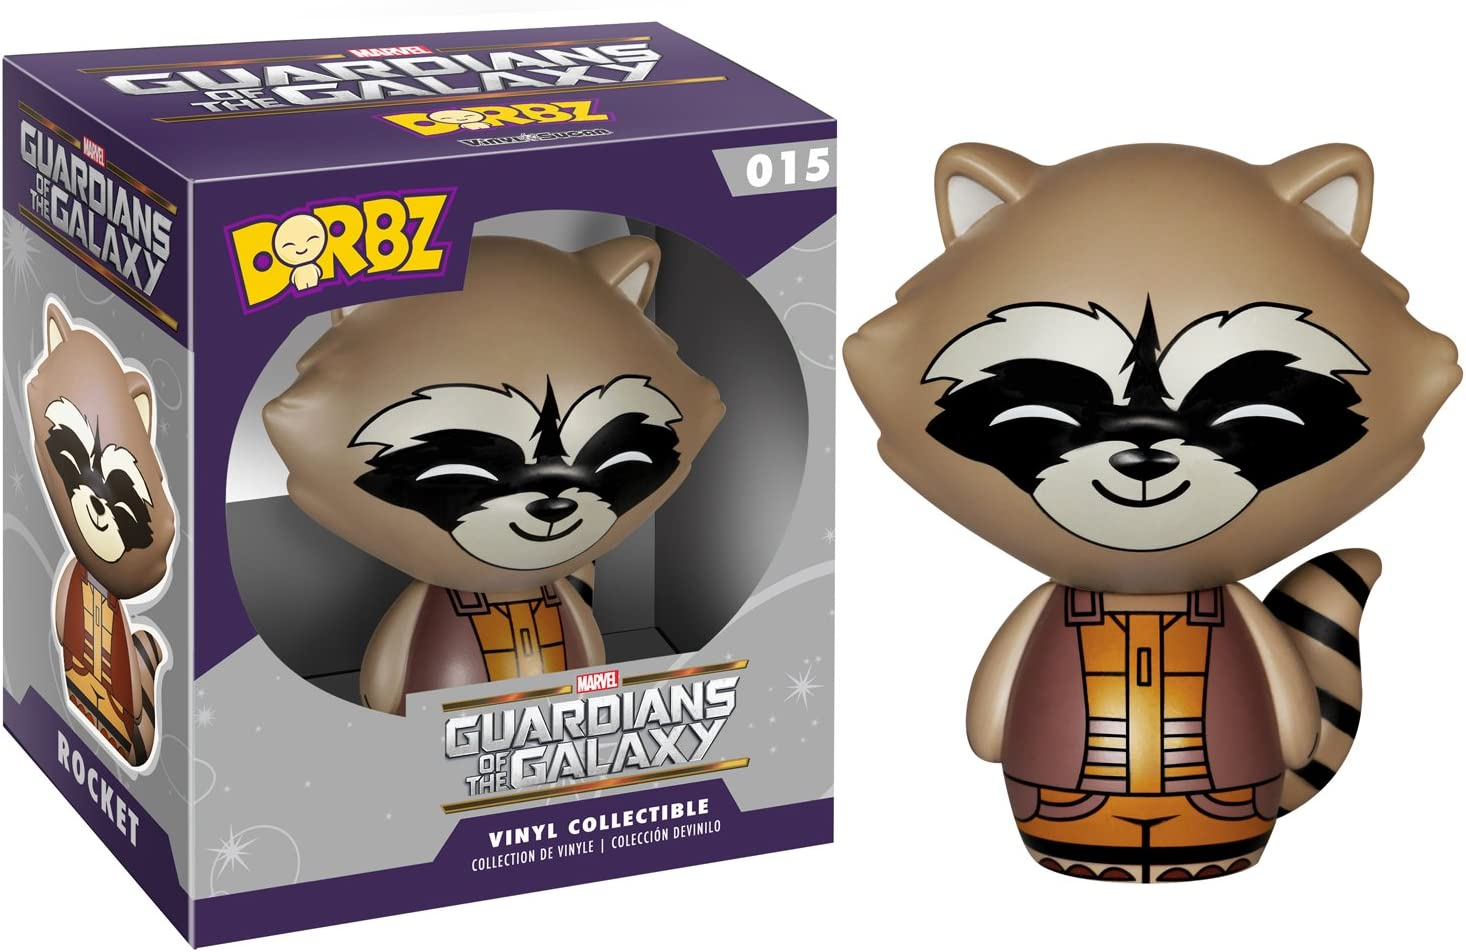 Gardiens de la galaxie rocket raccoon Funko dorbz figurine En Vinyle NEUF /& en stock